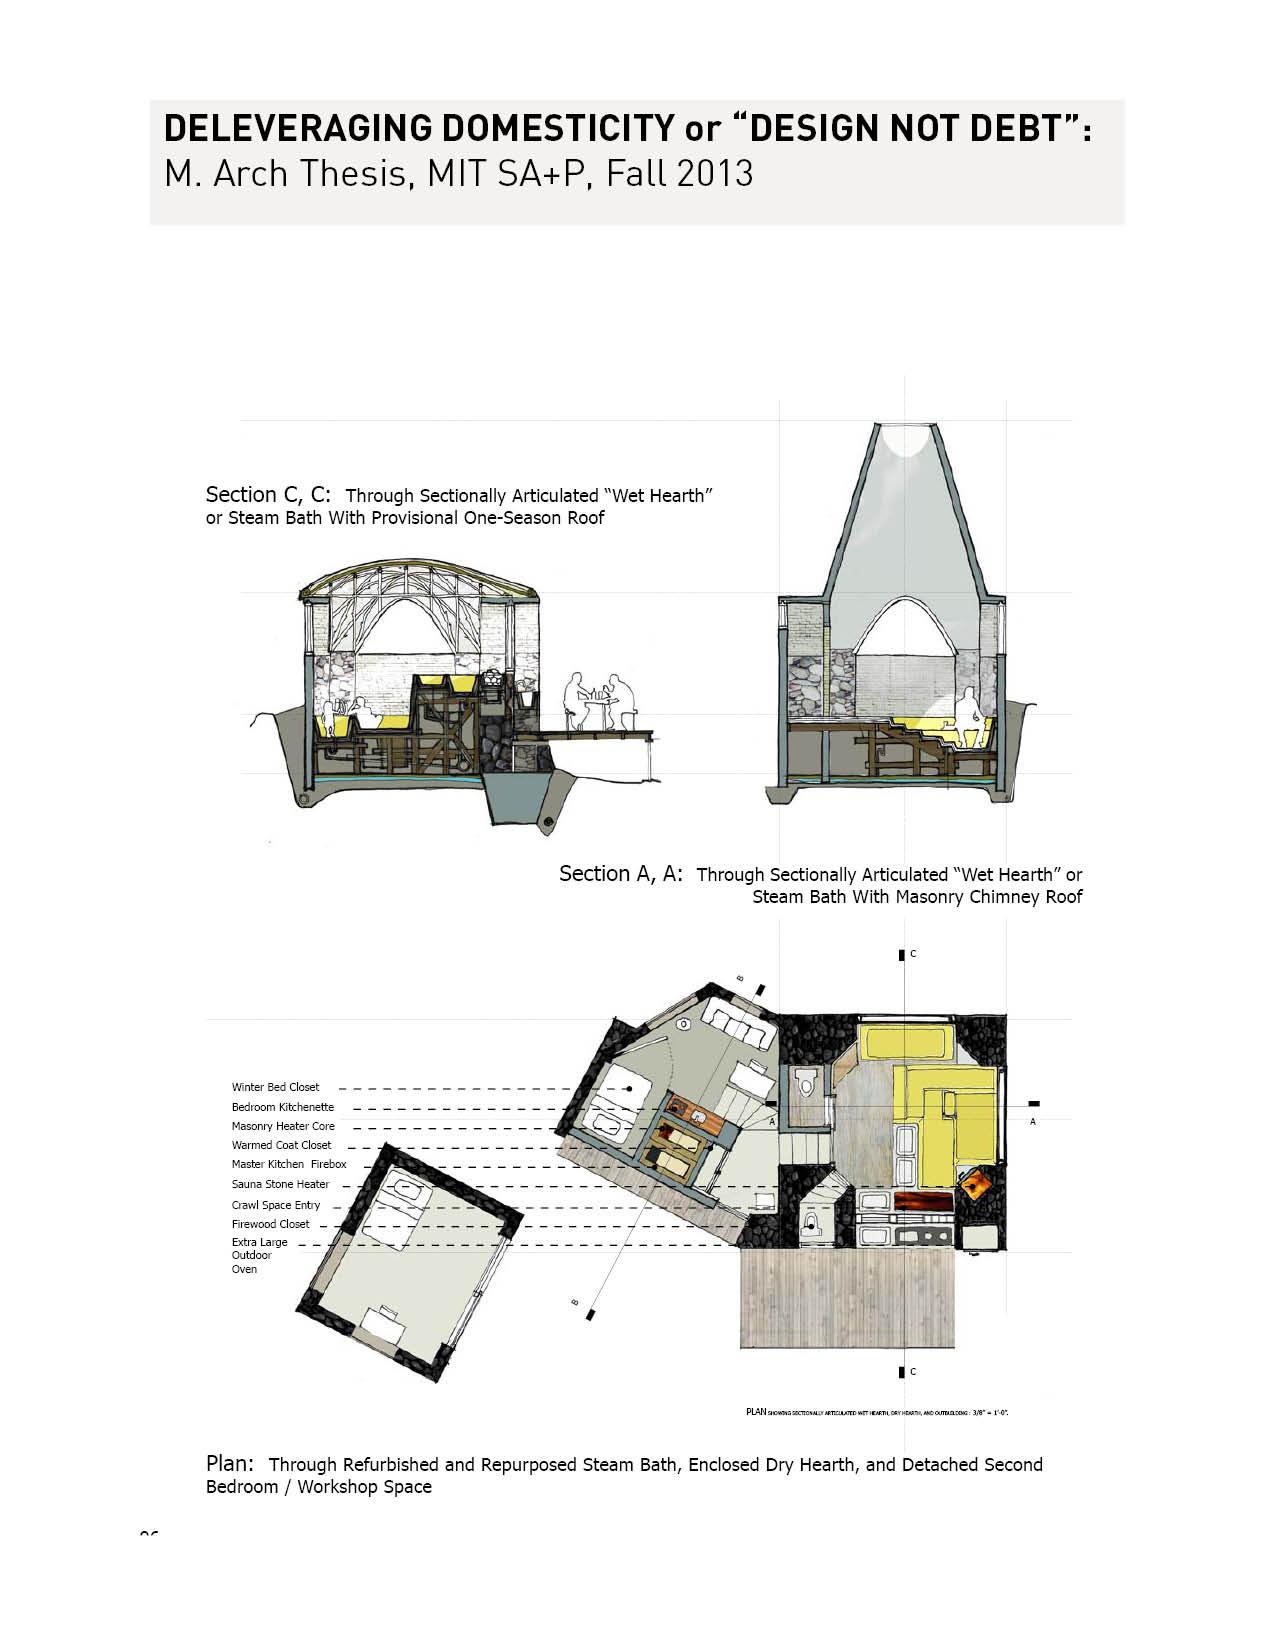 MIT_thesis37.jpg